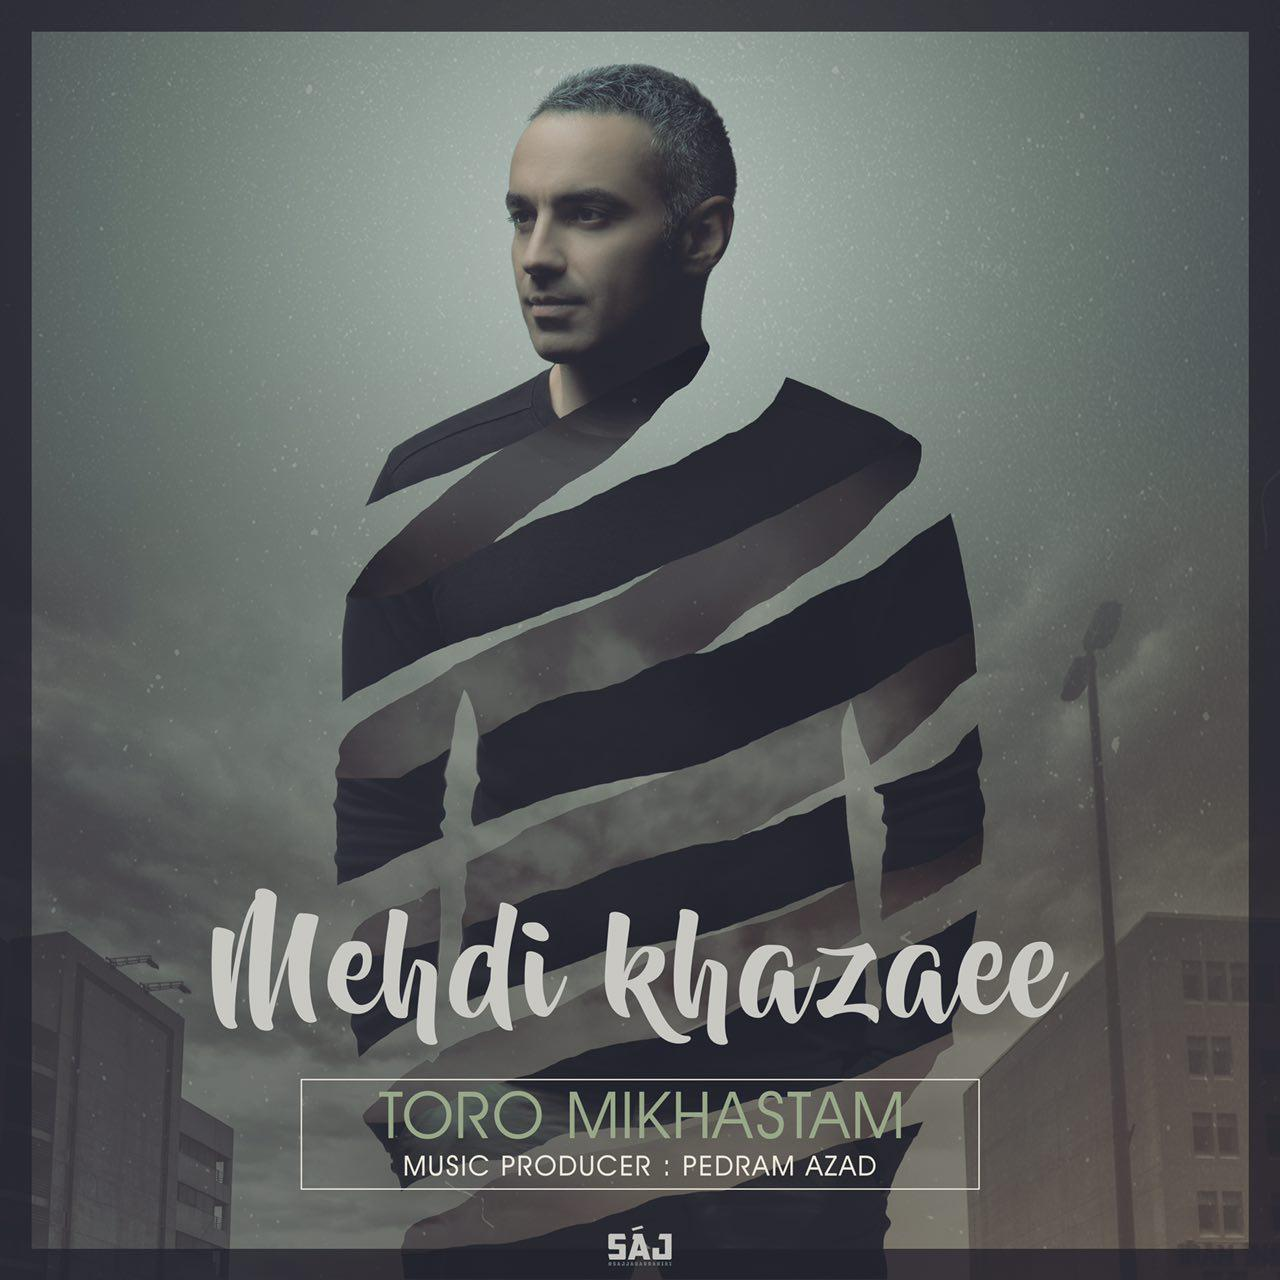 Mehdi Khazaee – Toro Mikhastam